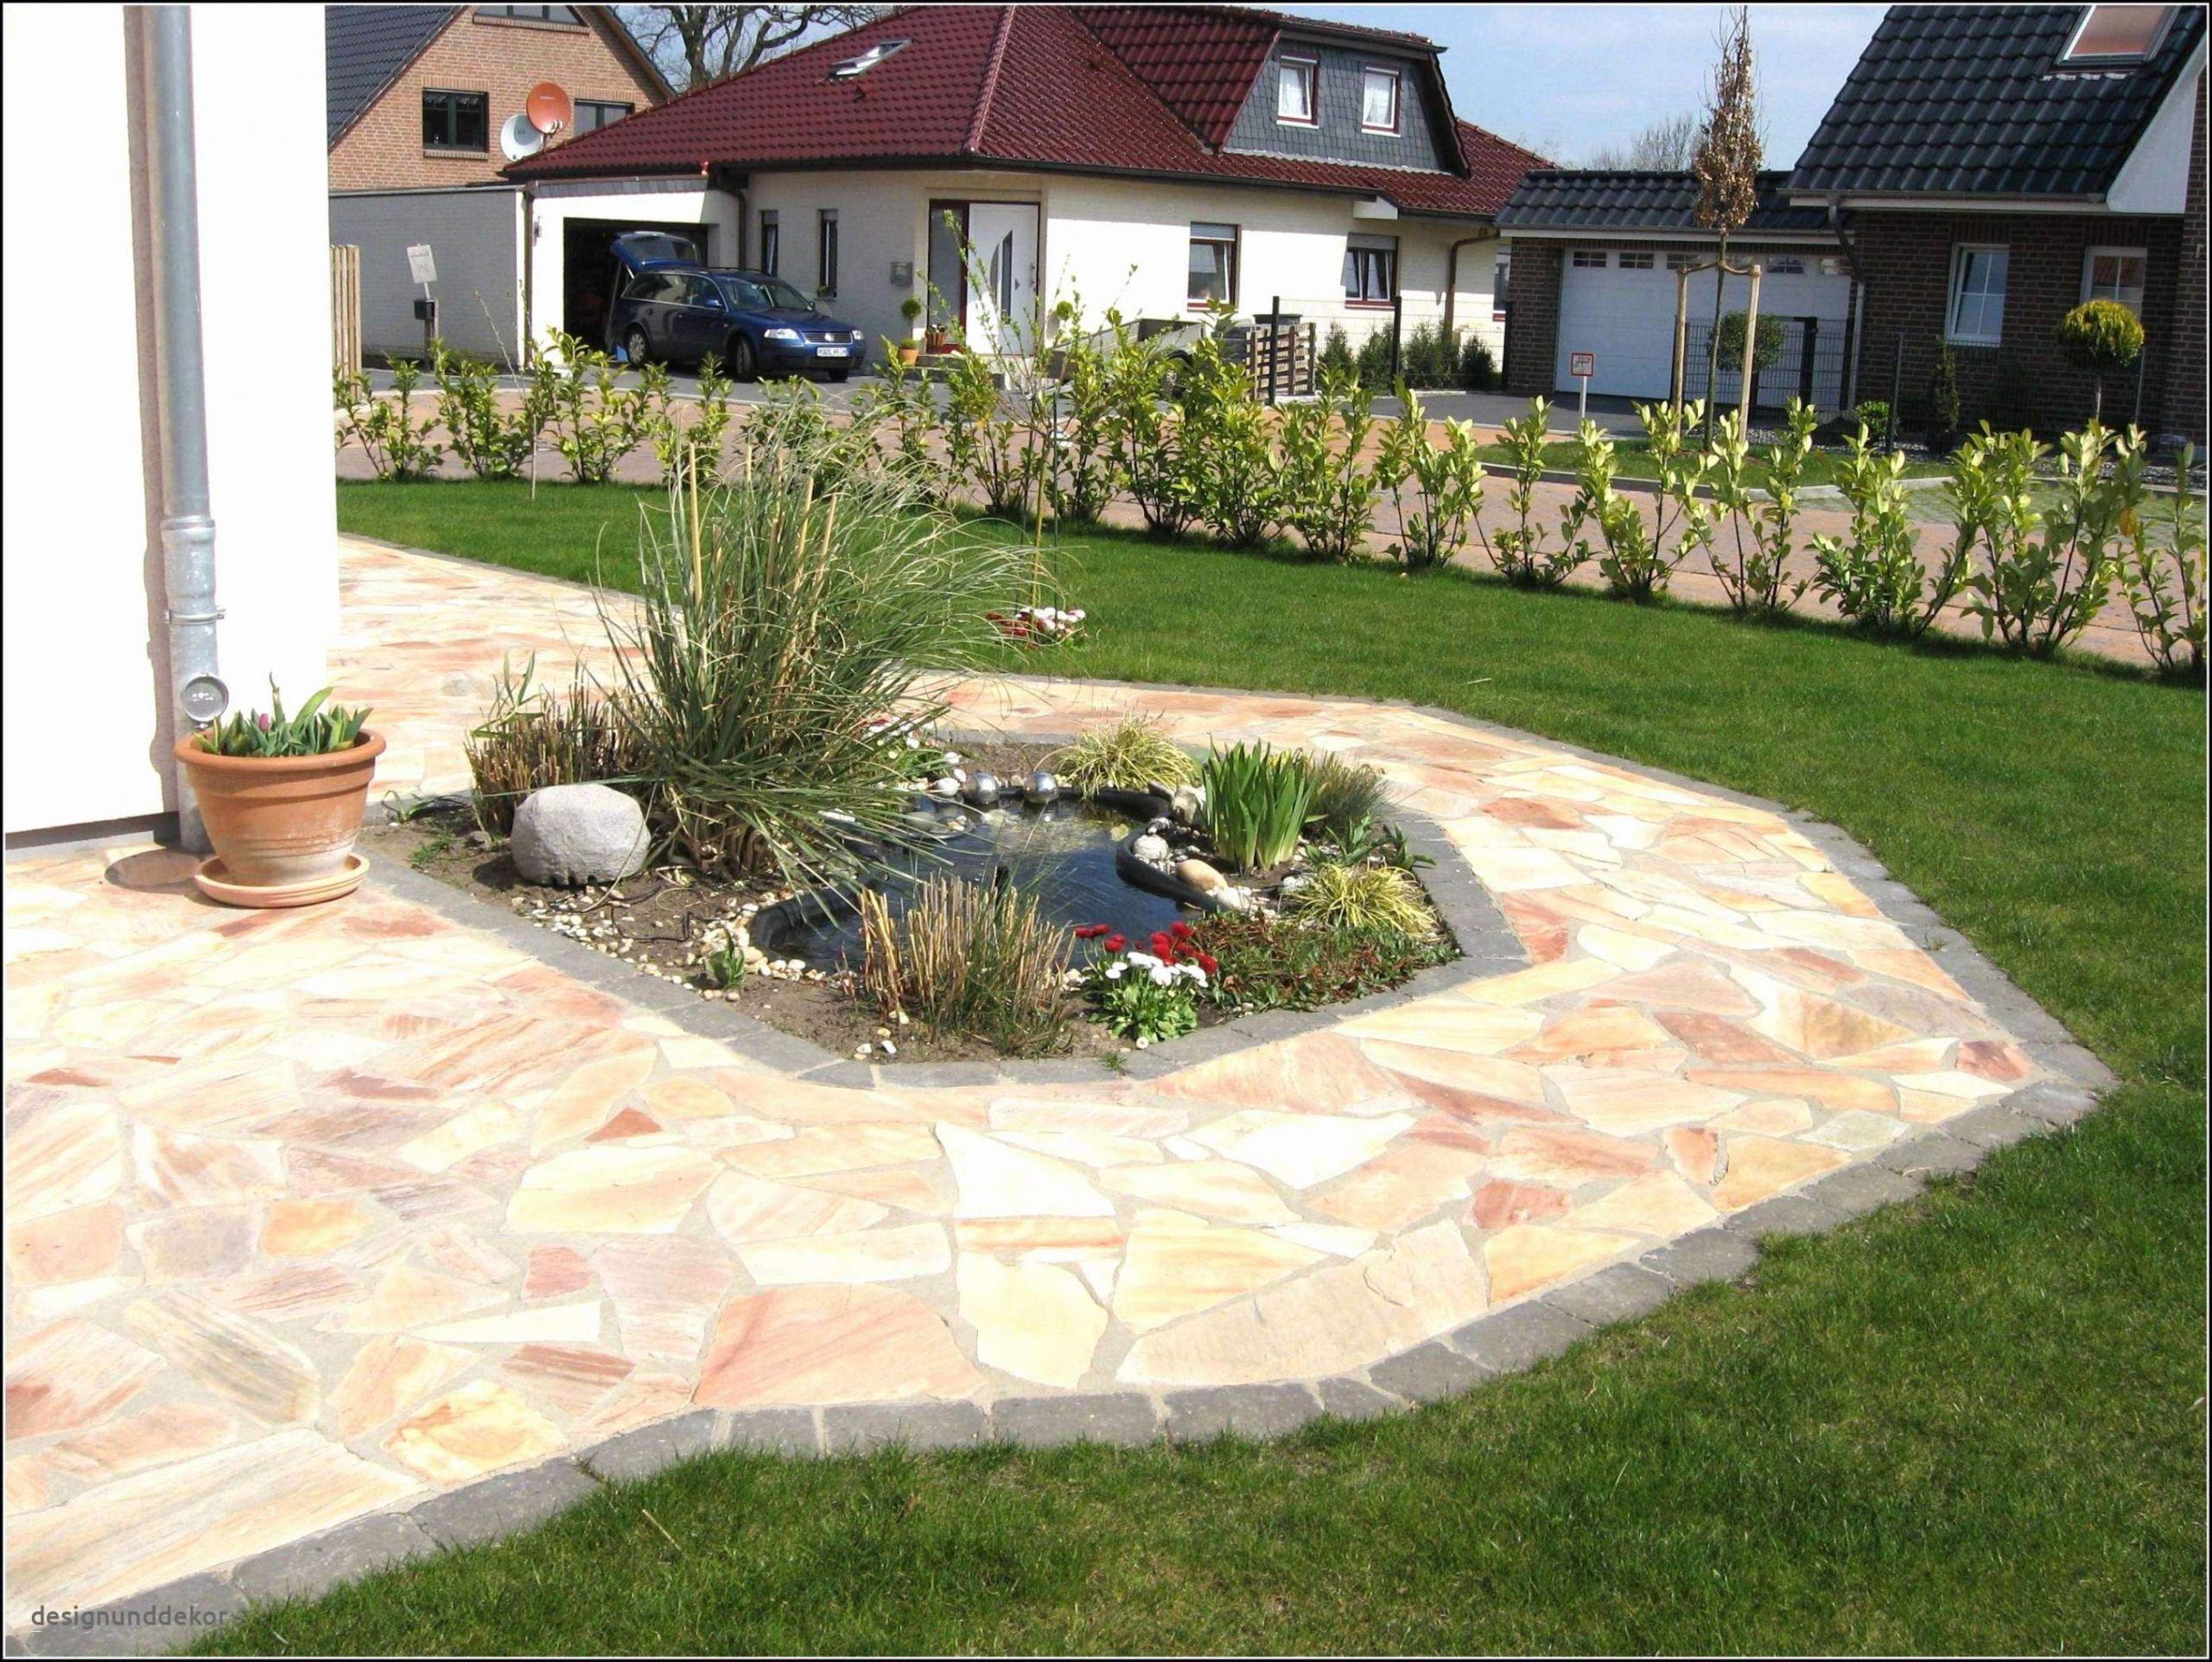 Garten Am Hang Ideen Bilder Genial Hang Gestalten Pflegeleicht — Temobardz Home Blog